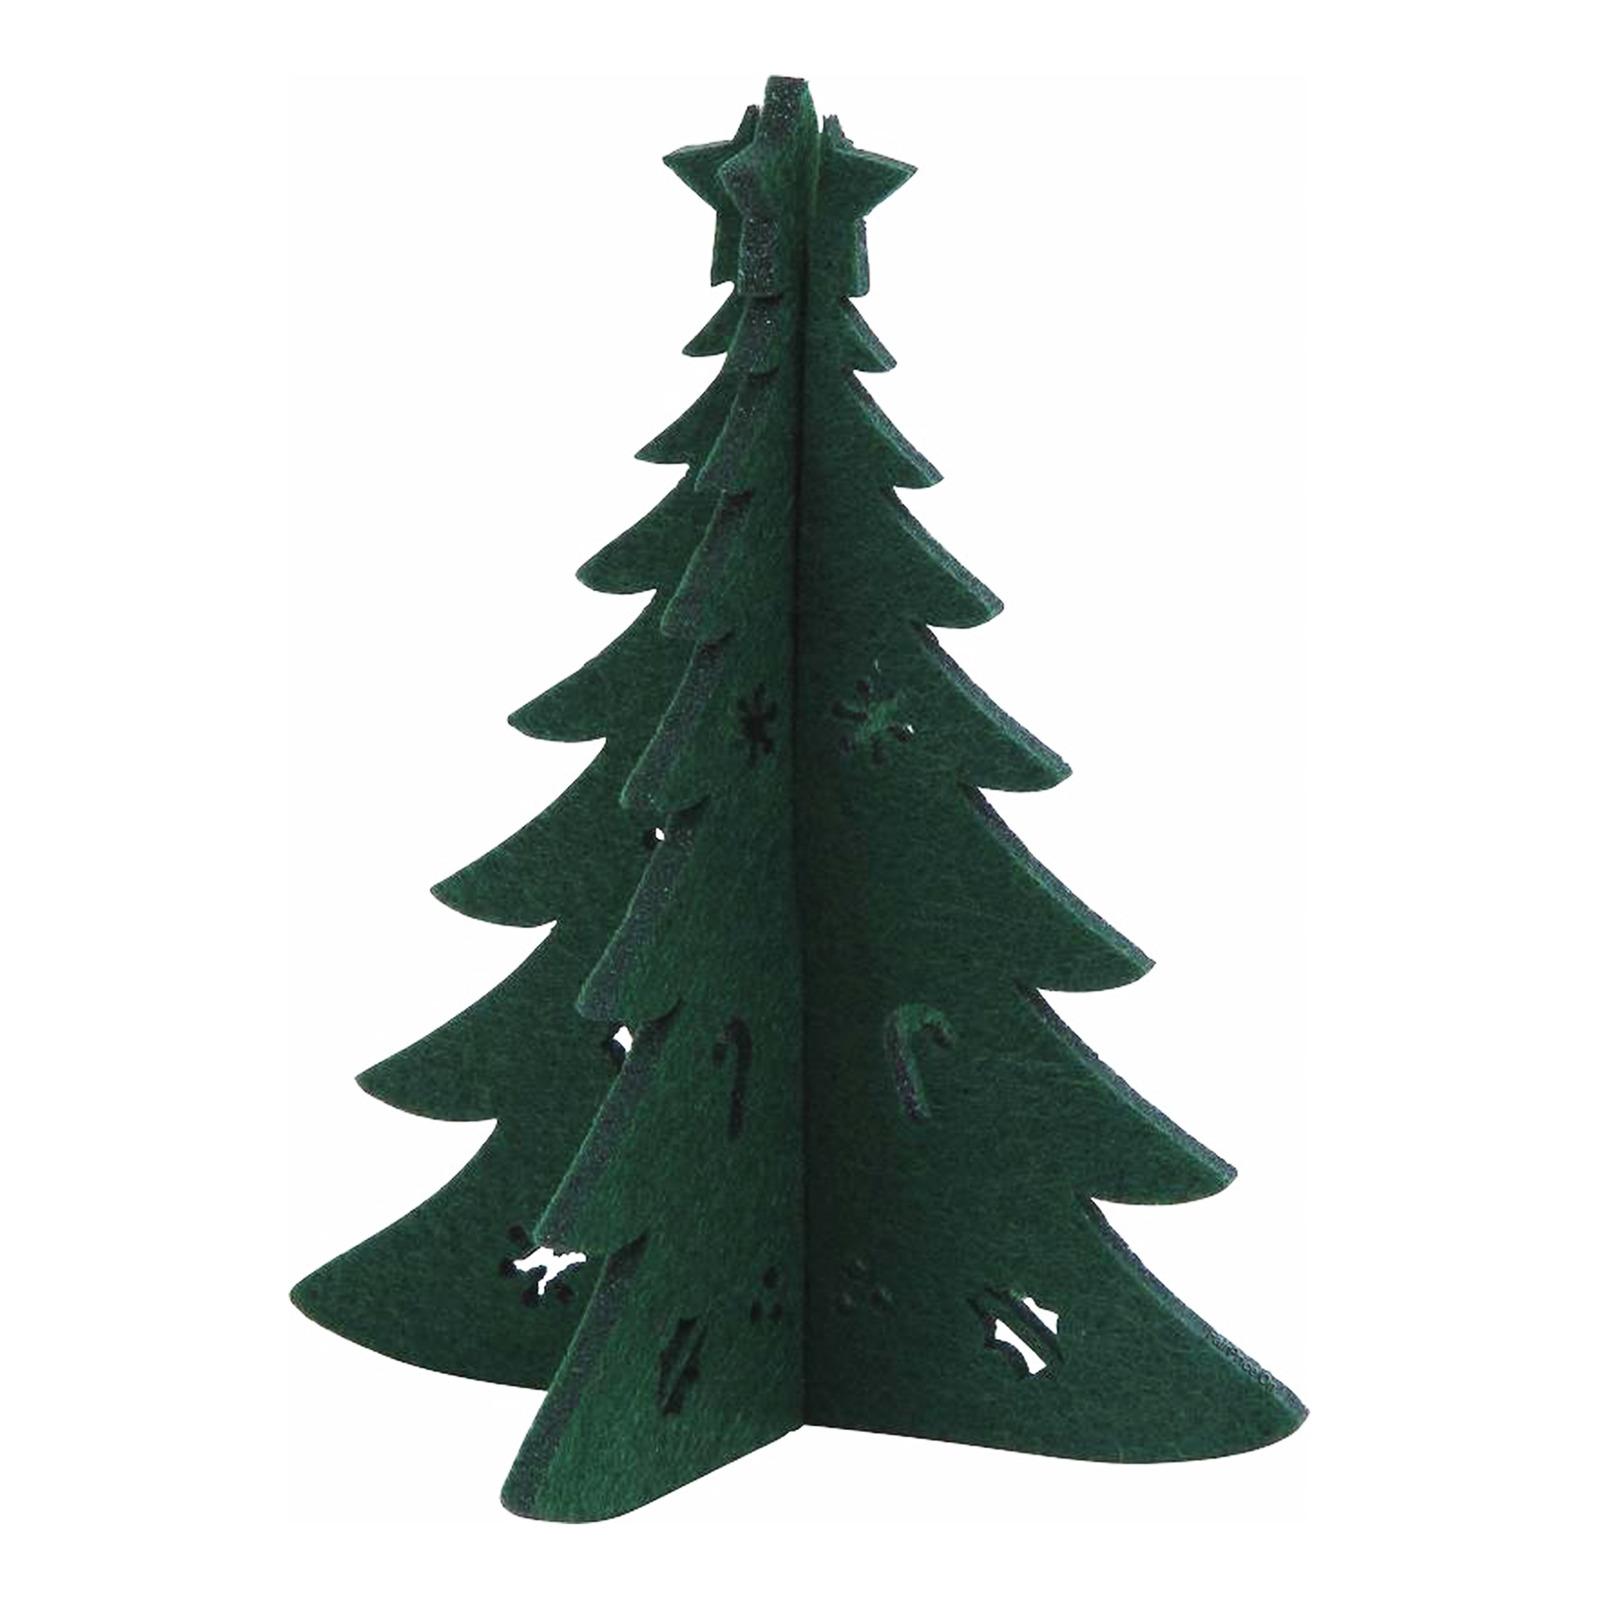 Imported Christmas Felt Decoration - Christmas Tree